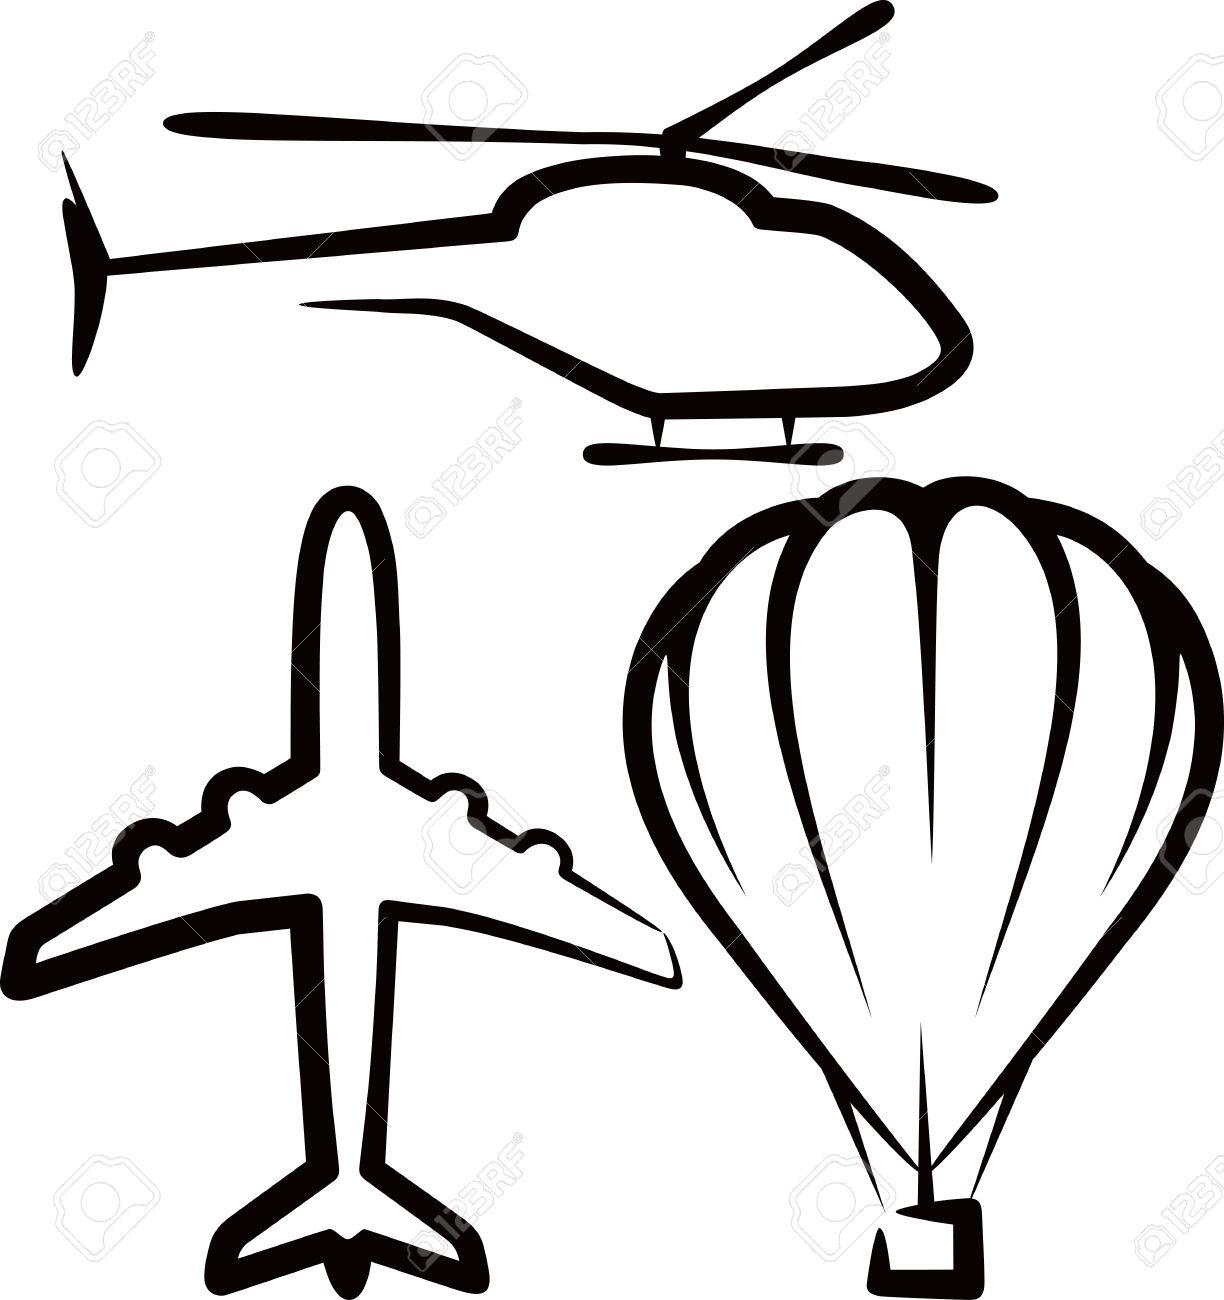 1224x1300 Simple Way To Draw Plane Simple Way To Draw A Plane